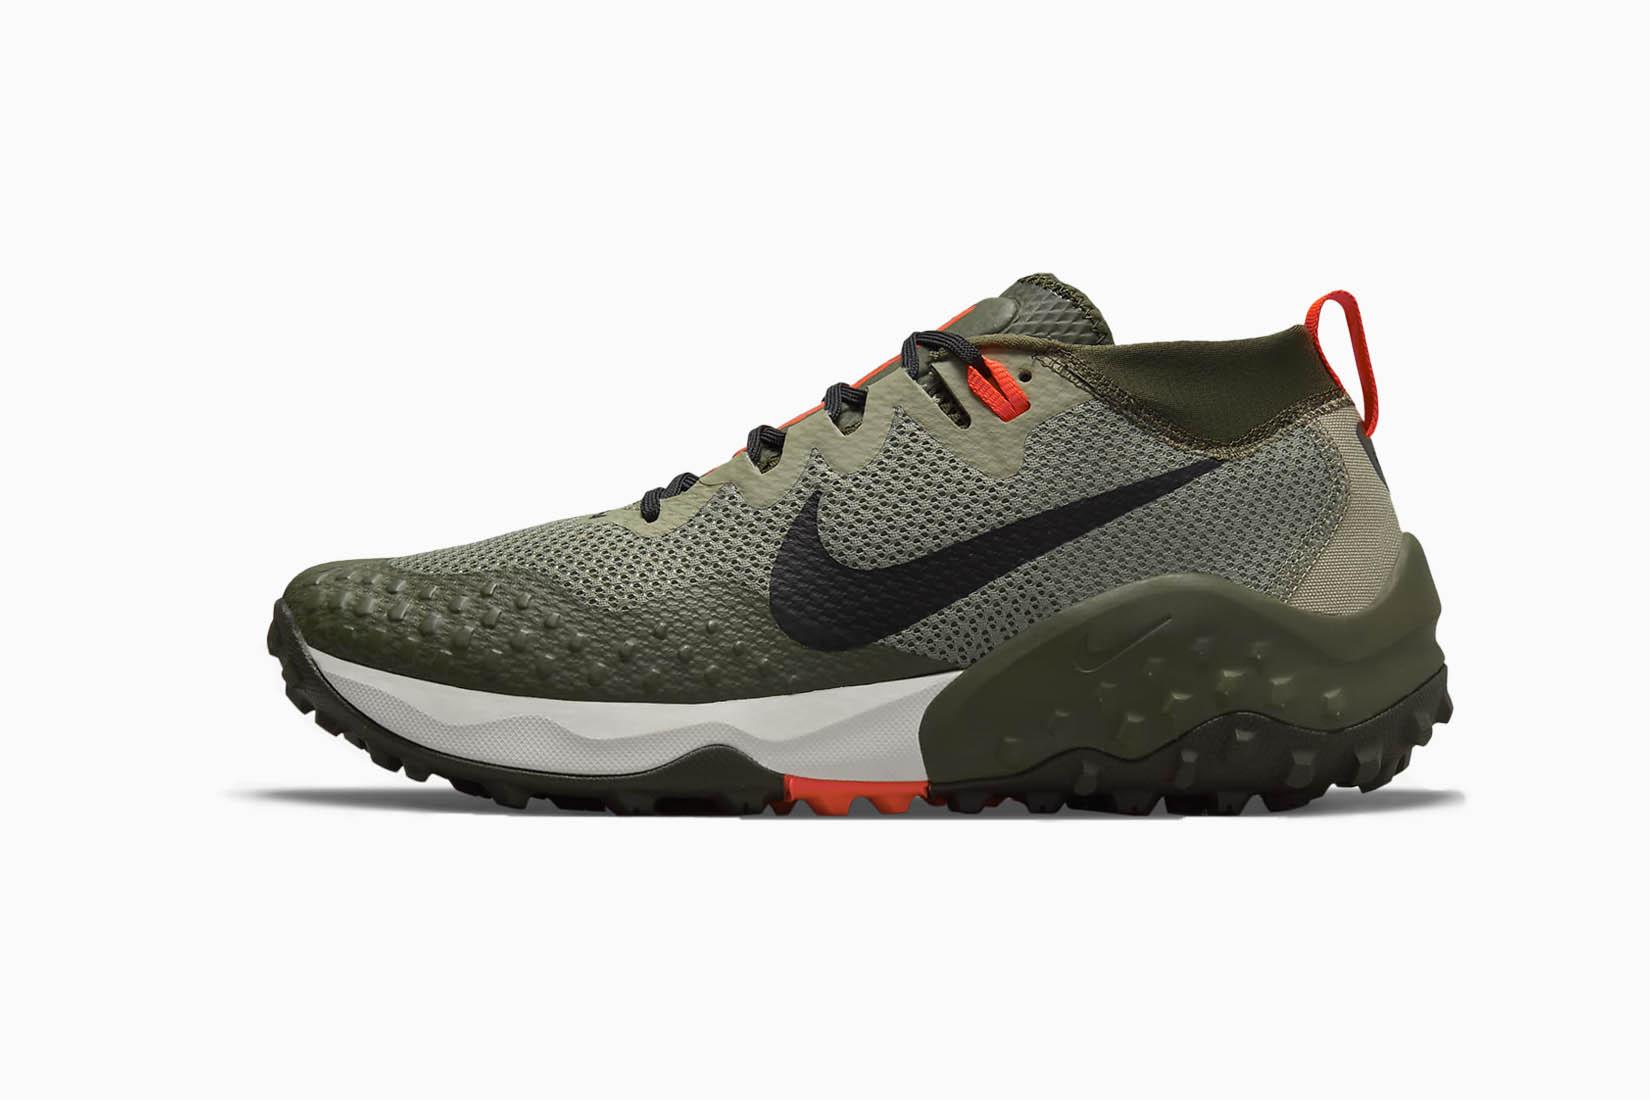 best nike running shoes men nike winflo 8 review Luxe Digital